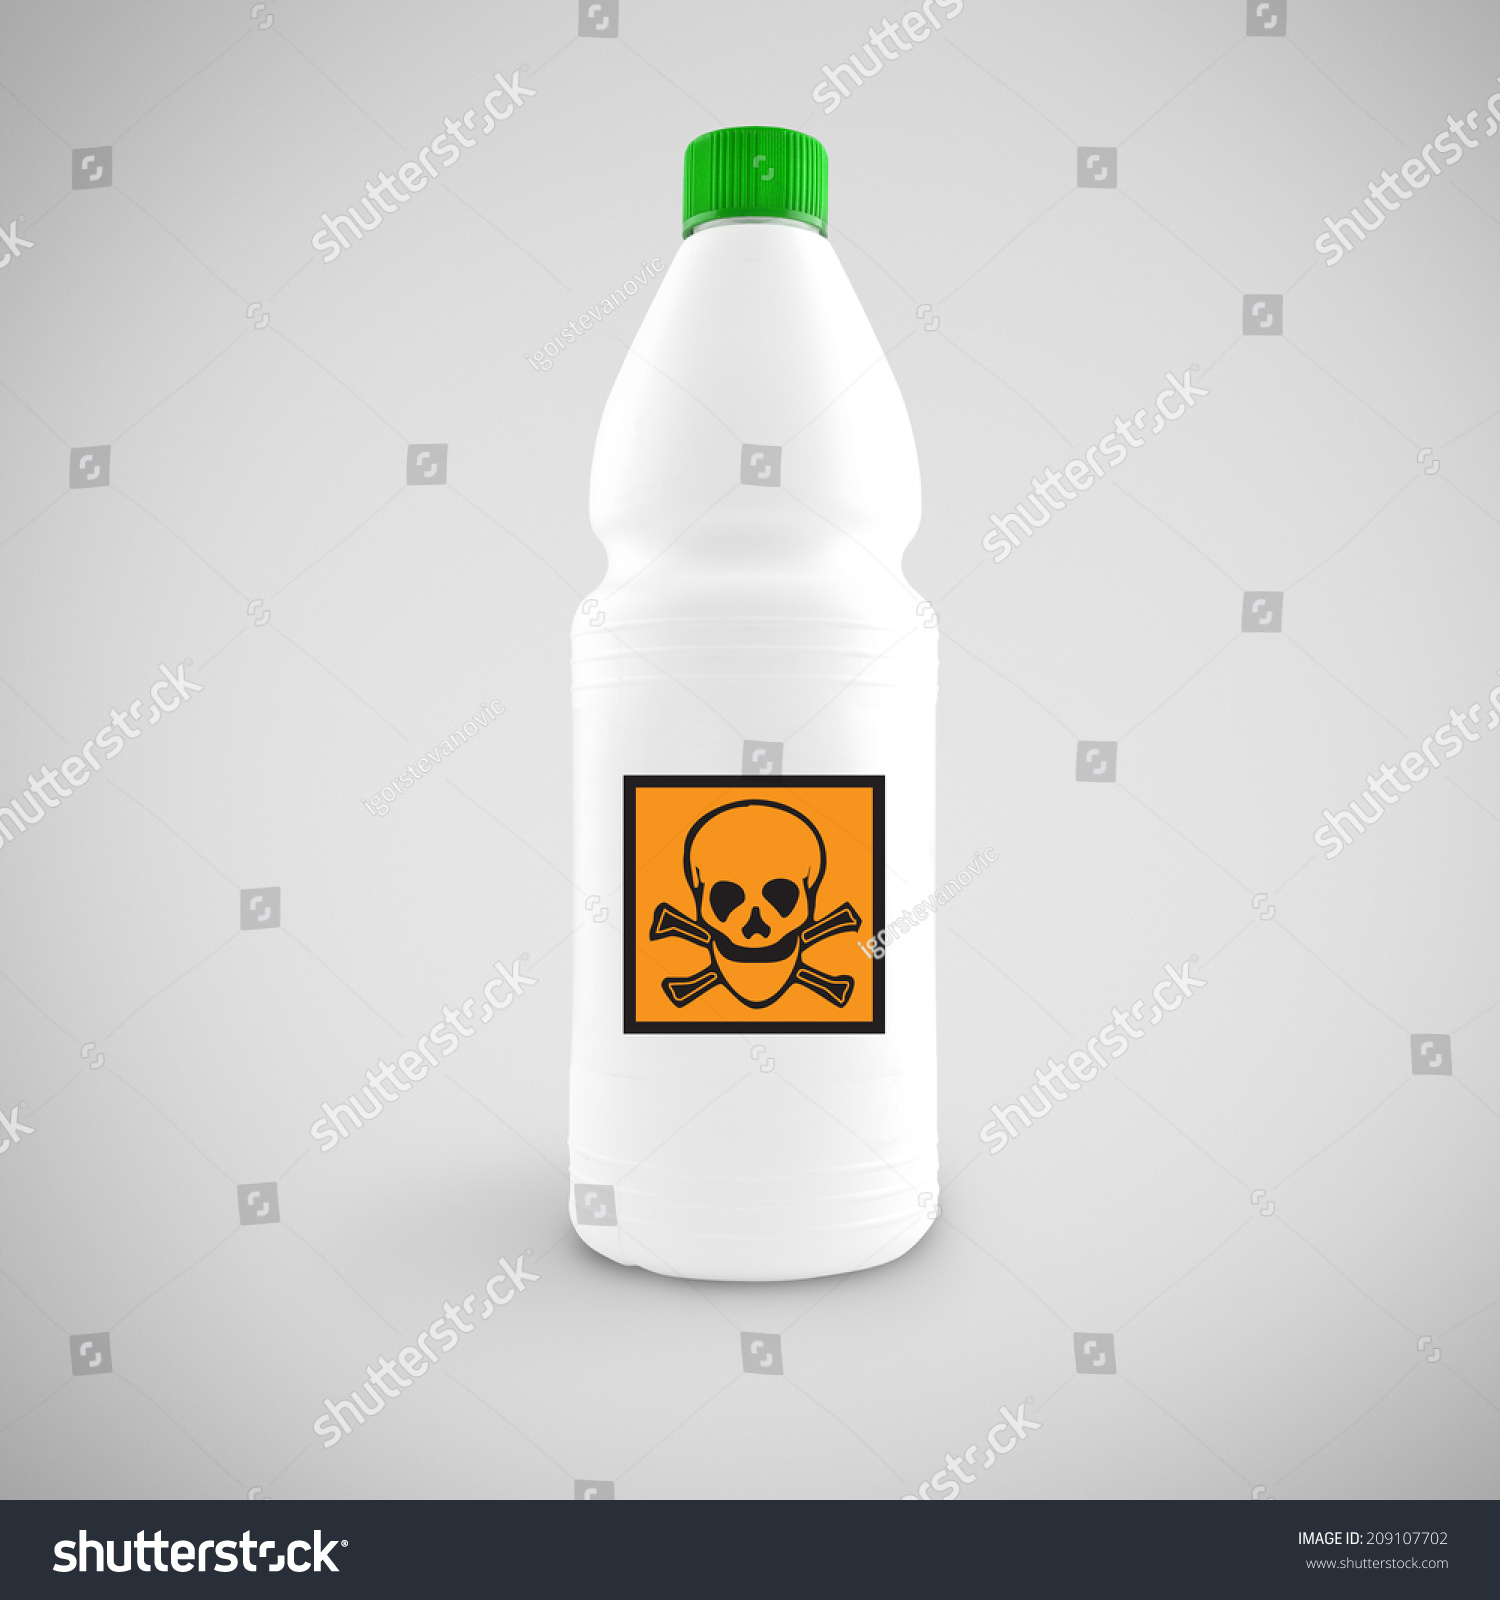 Bottle Chemical Liquid Hazard Symbol Toxic Stock Photo Edit Now